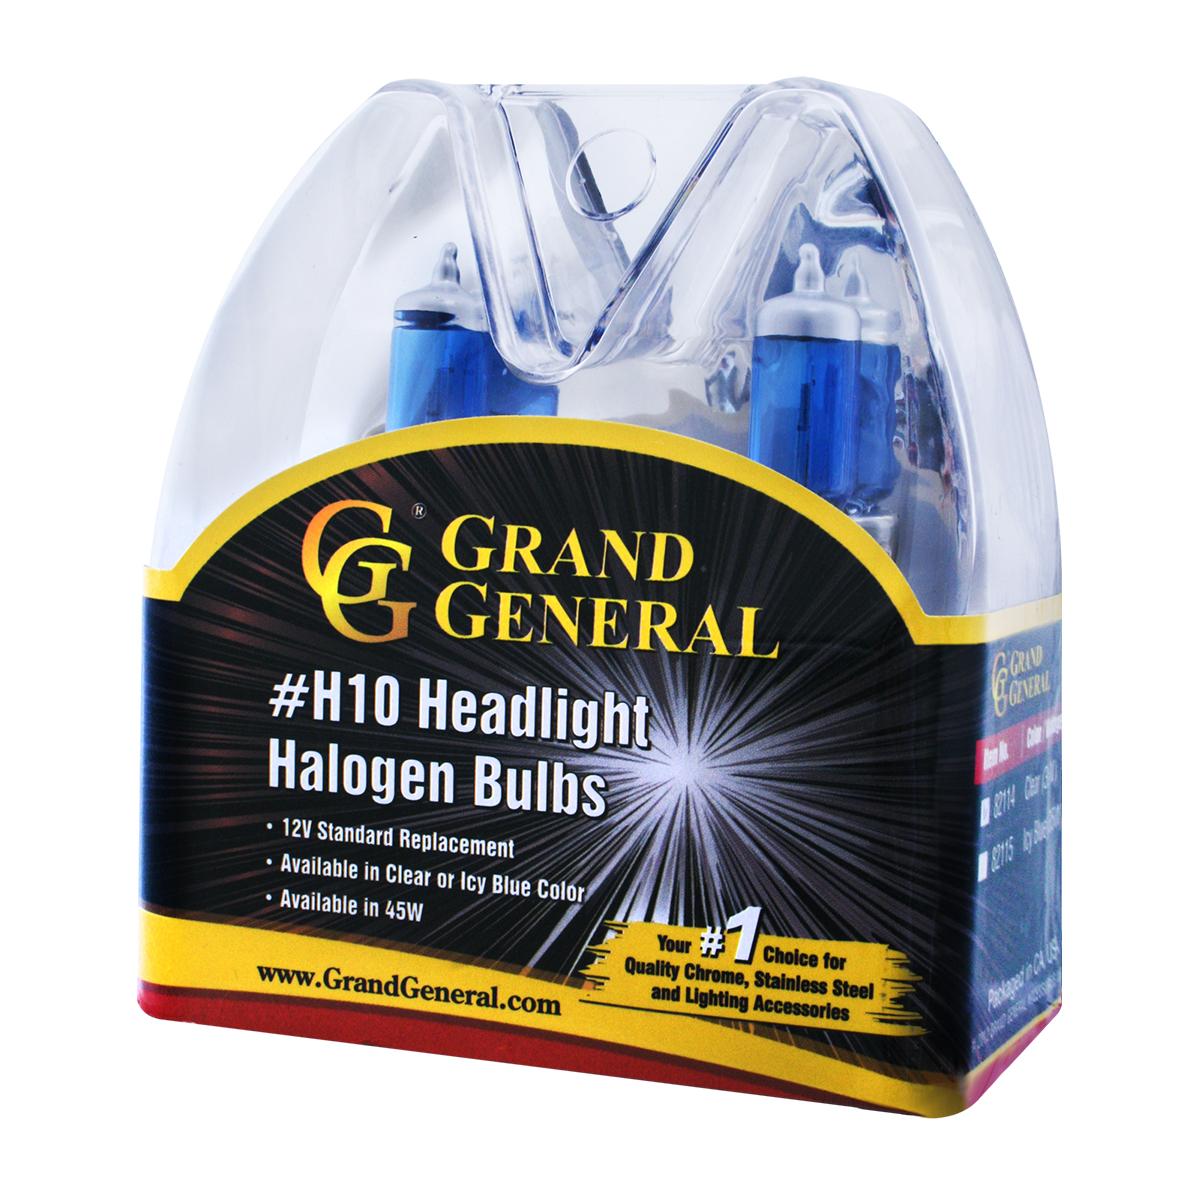 H10 Headlight Halogen Bulb